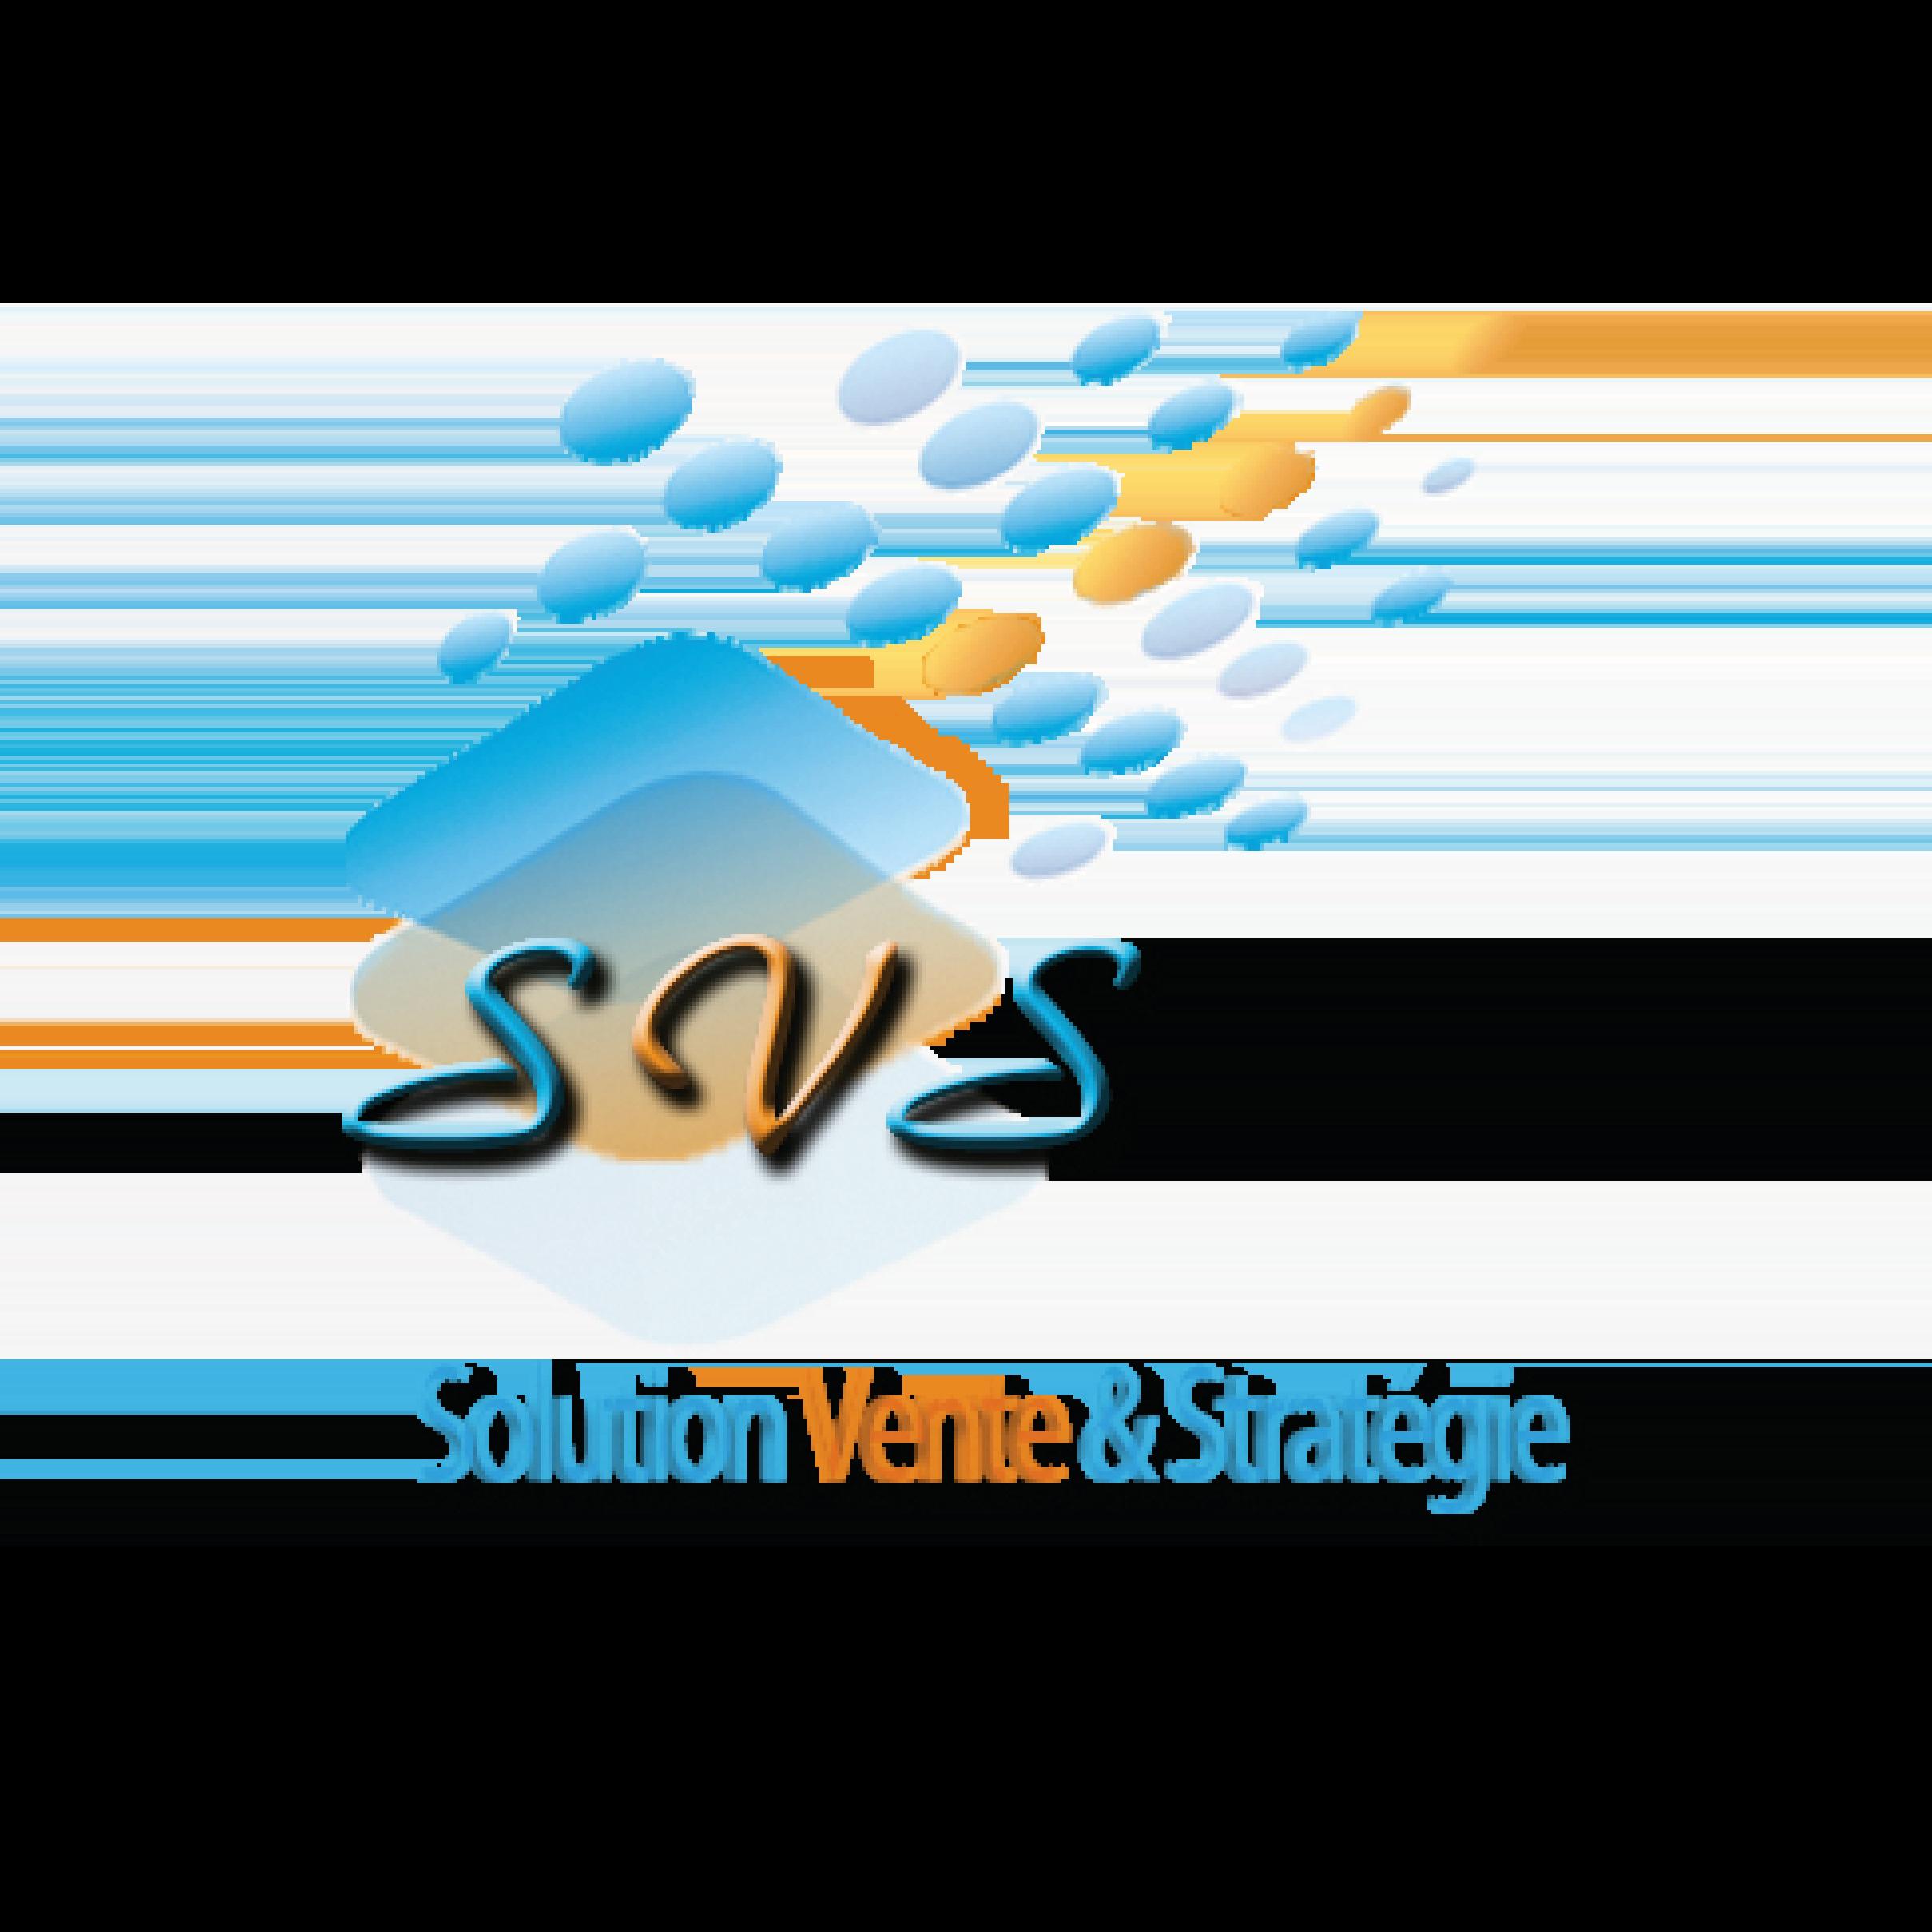 SVS Solution Vente & Stratégie